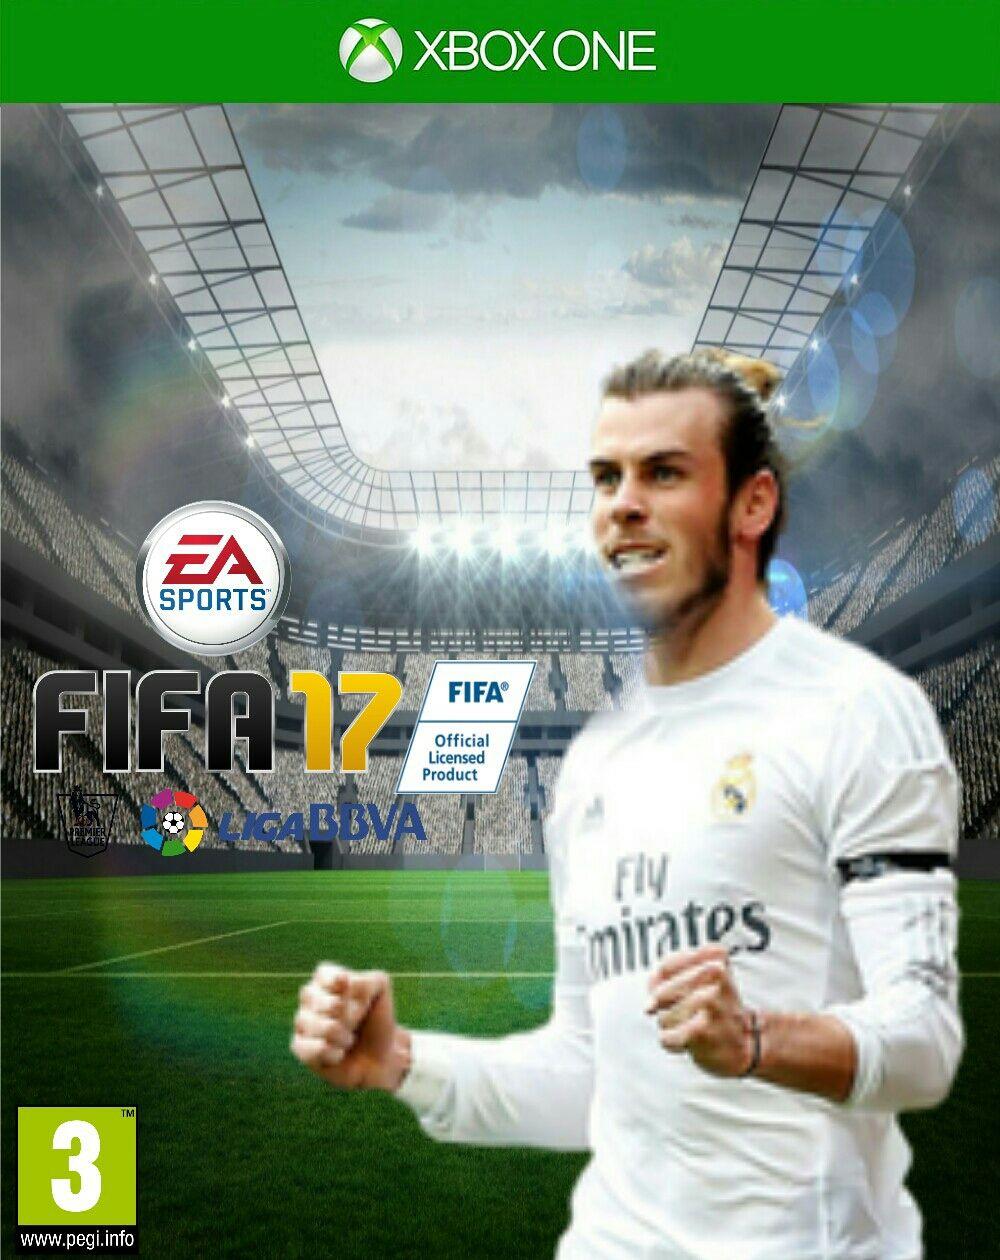 PIcsArt FIFA 17 Covers Bale Fifa, Fifa 17, Cover